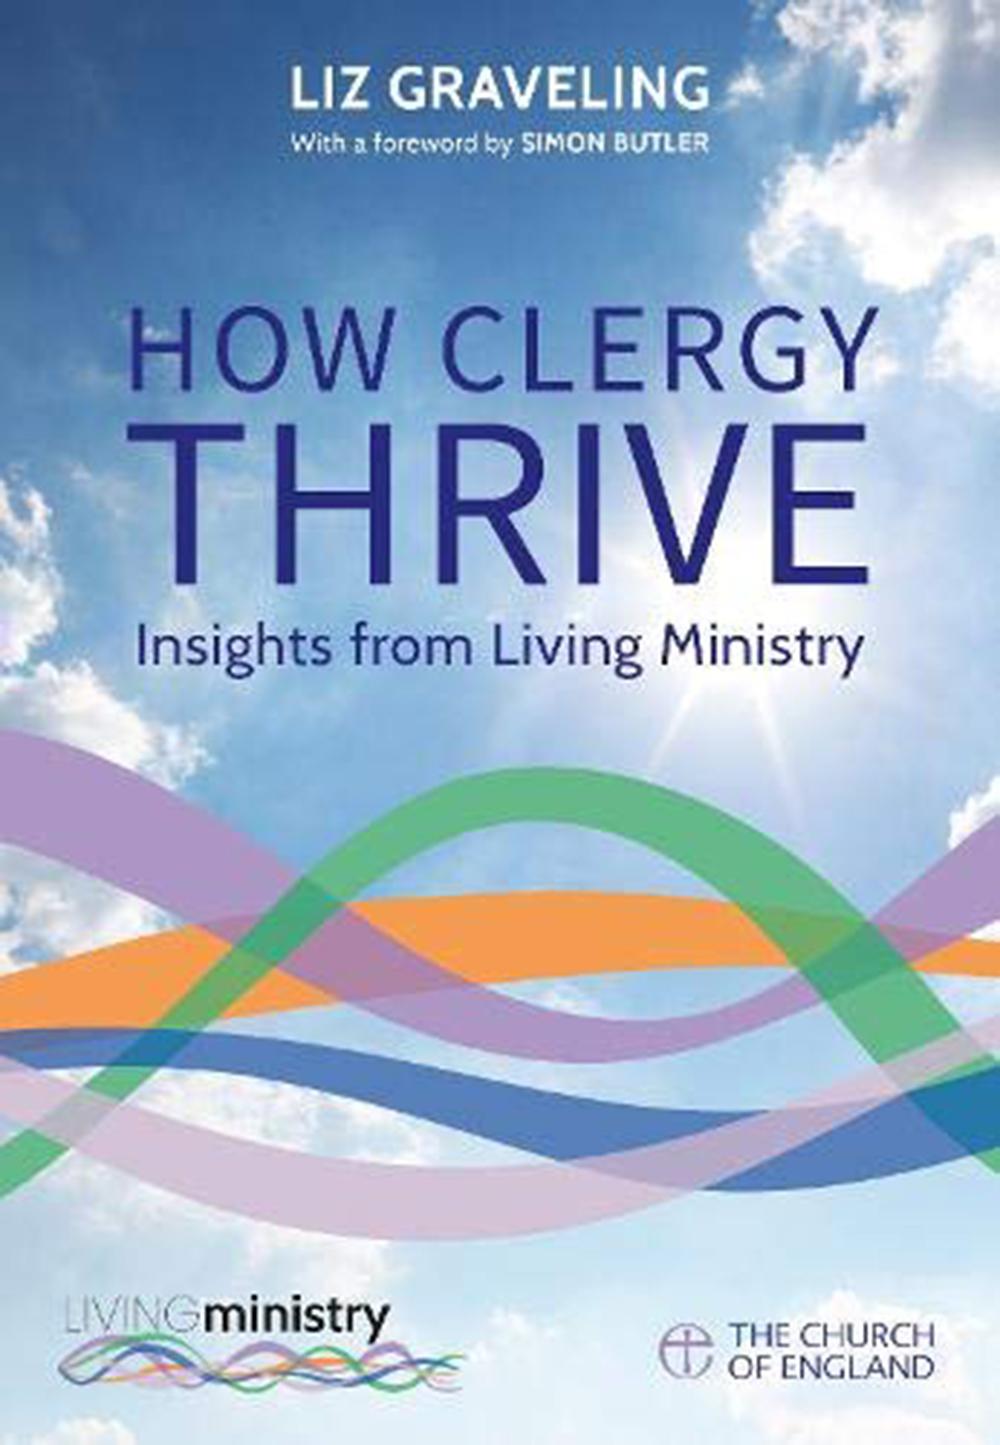 How Clergy Thrive